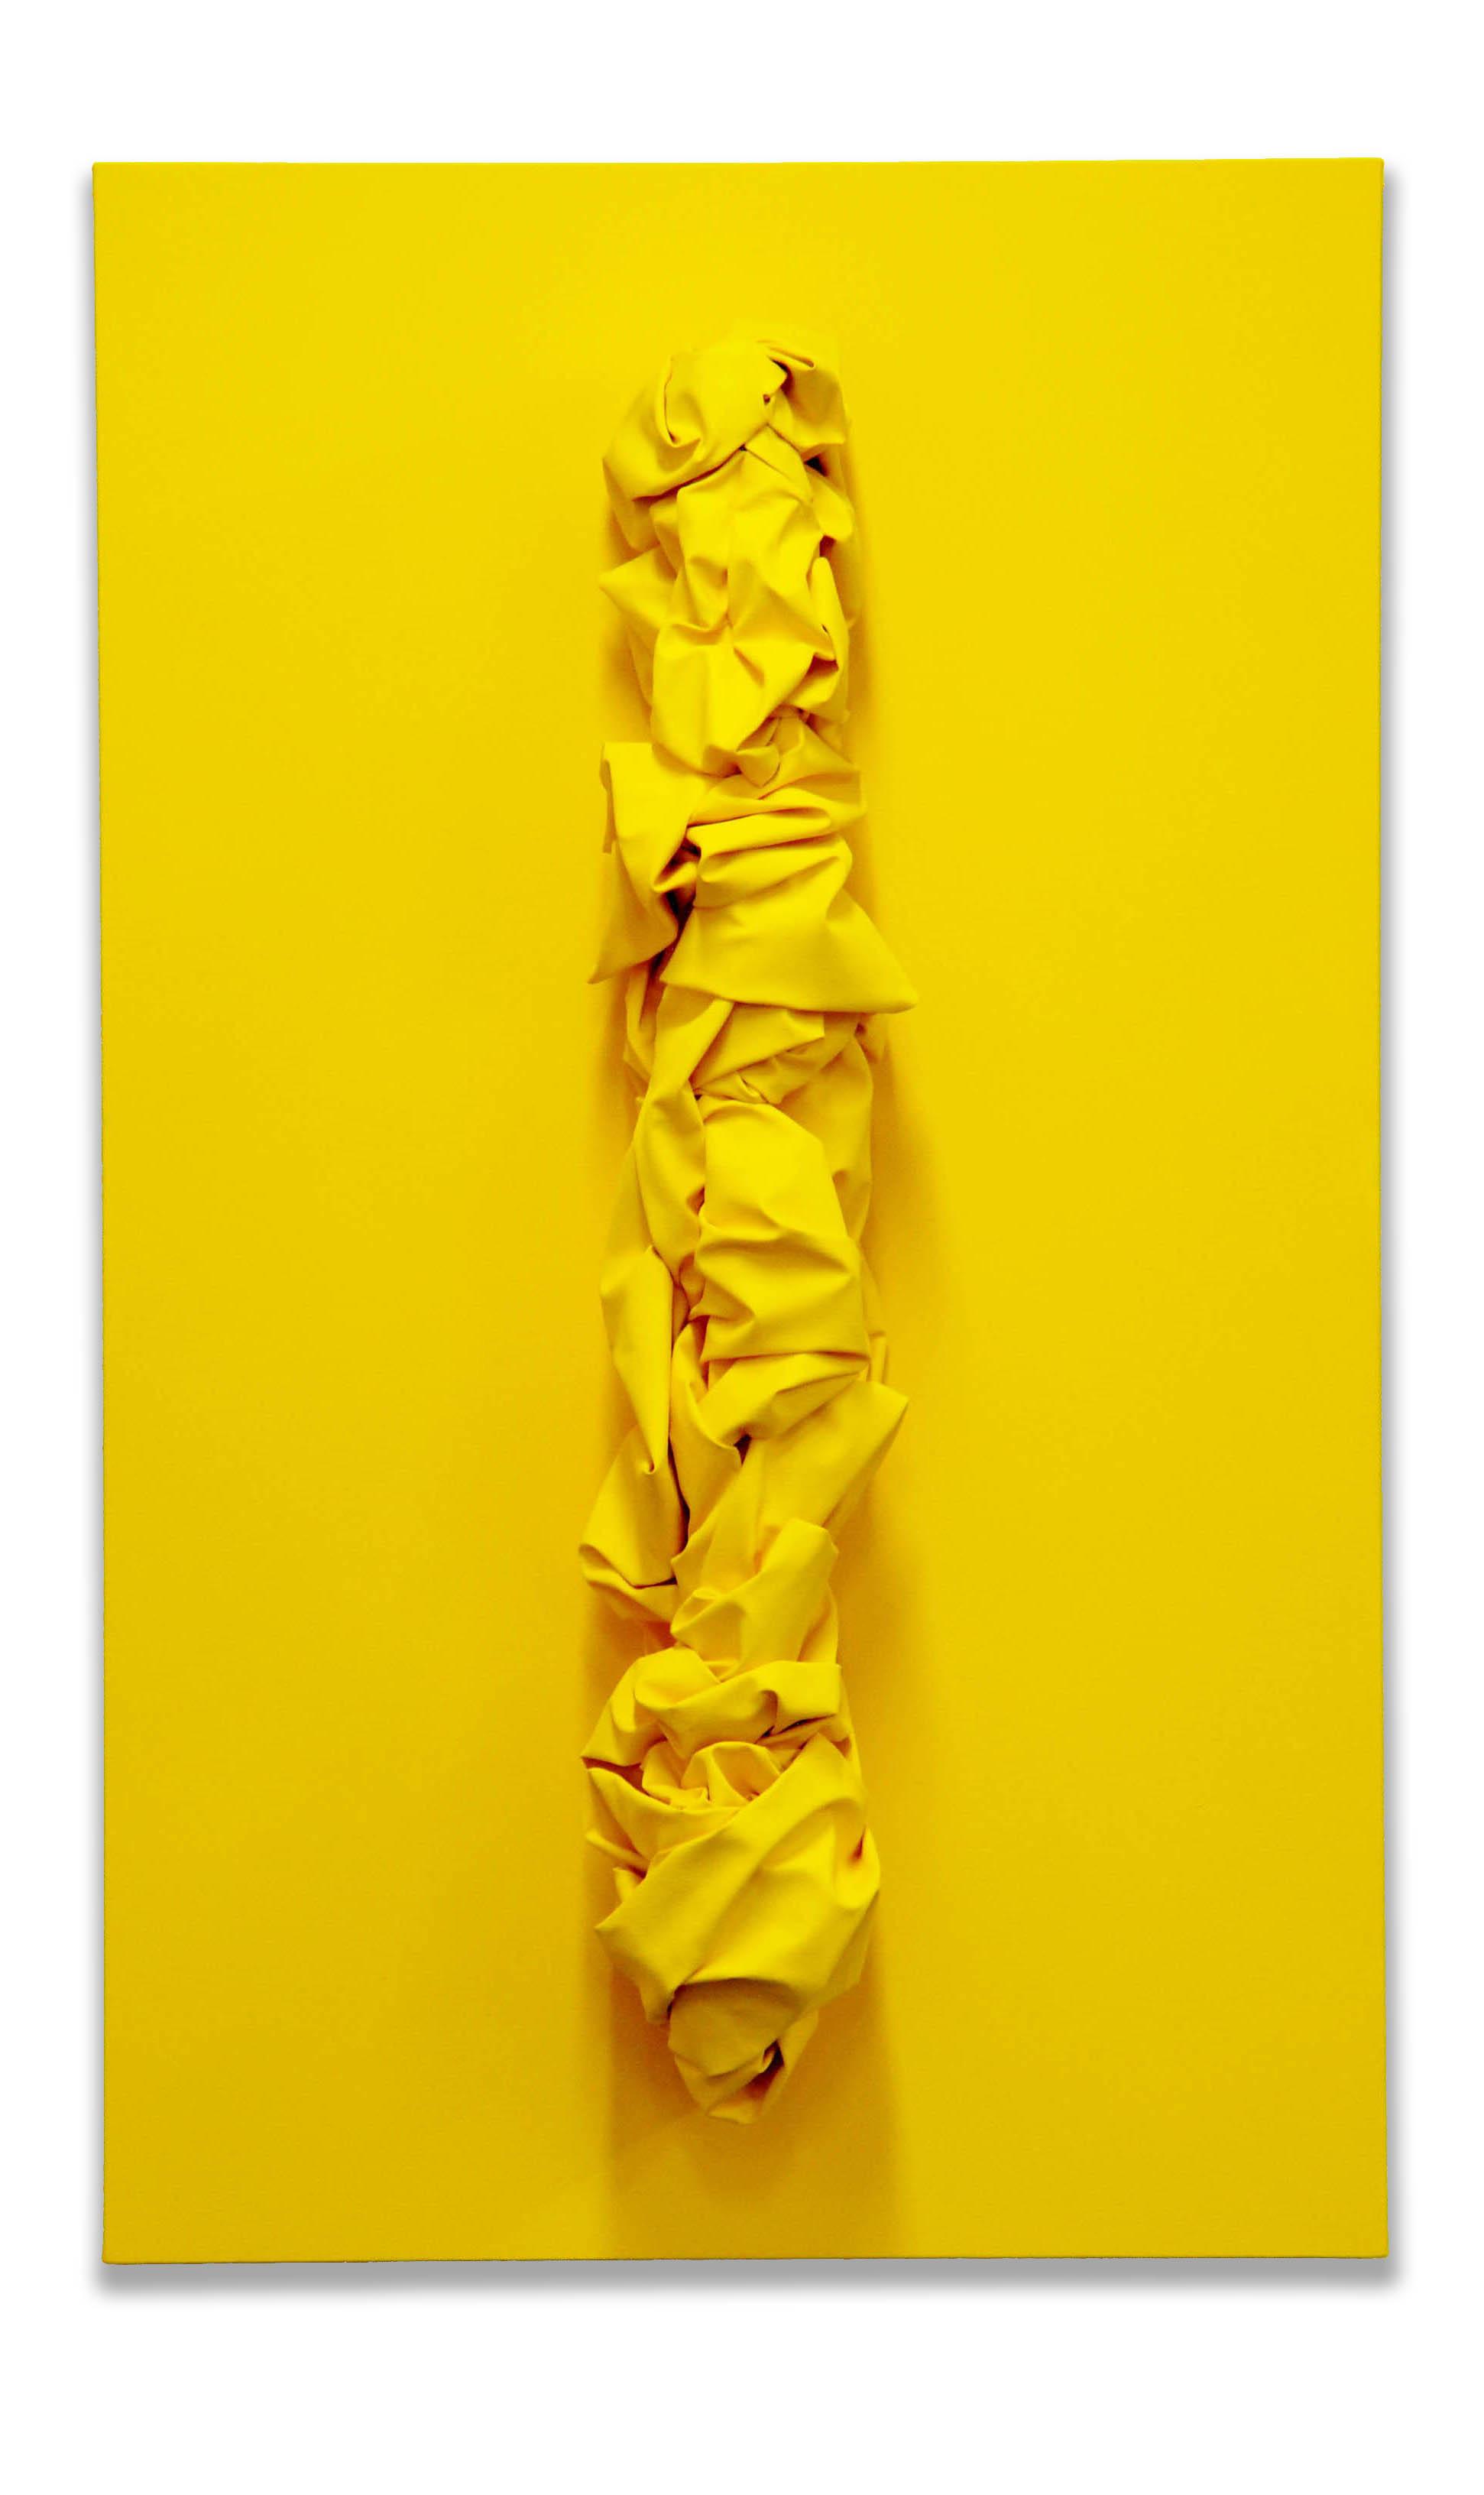 Untitled Cadmium Yellow -  2017  Pigmento acrilico su tela tesa su tavola  147 x 90 cm